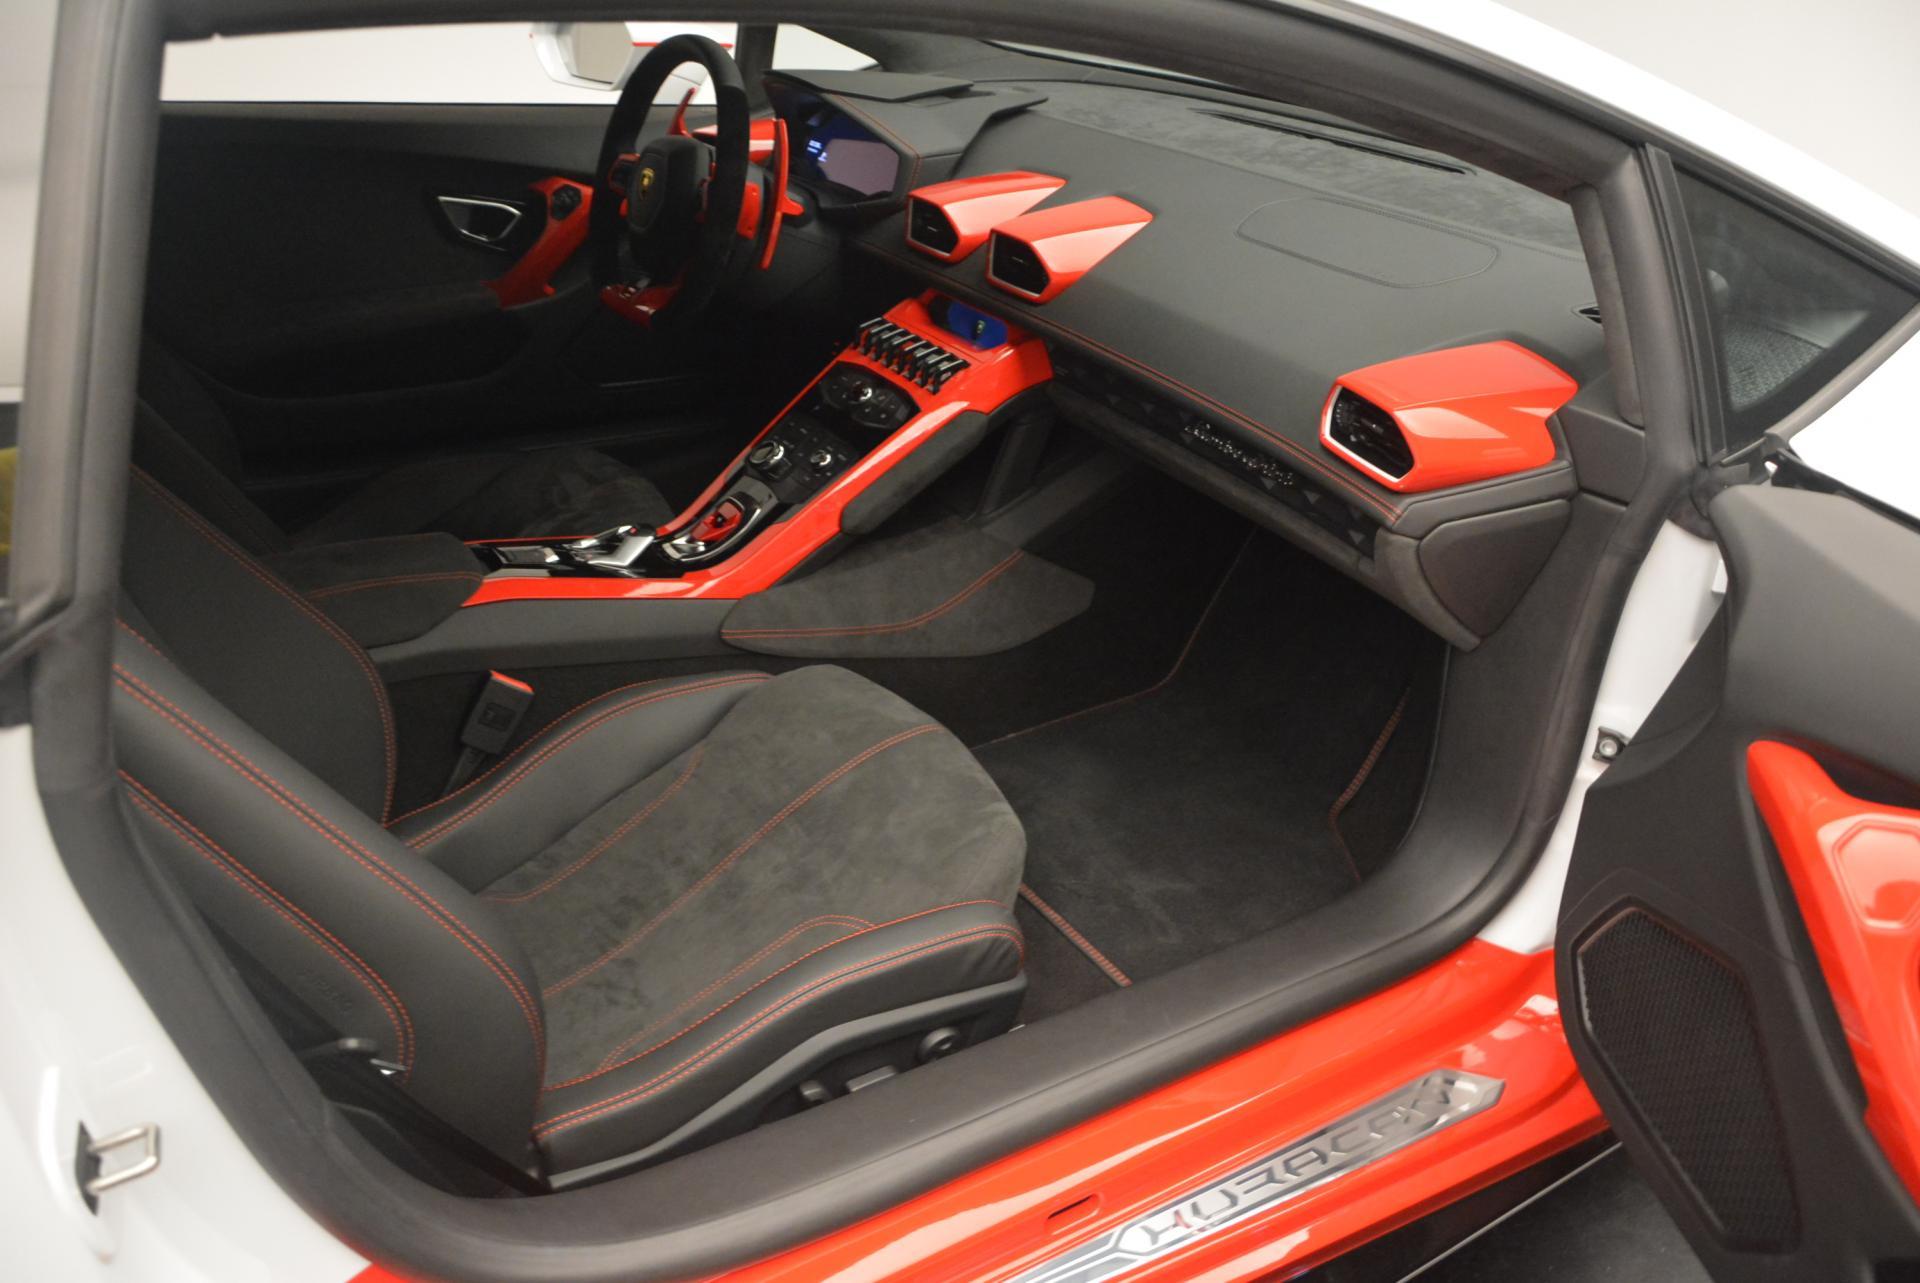 Used 2015 Lamborghini Huracan LP610-4 For Sale In Greenwich, CT. Alfa Romeo of Greenwich, F1707A 114_p20